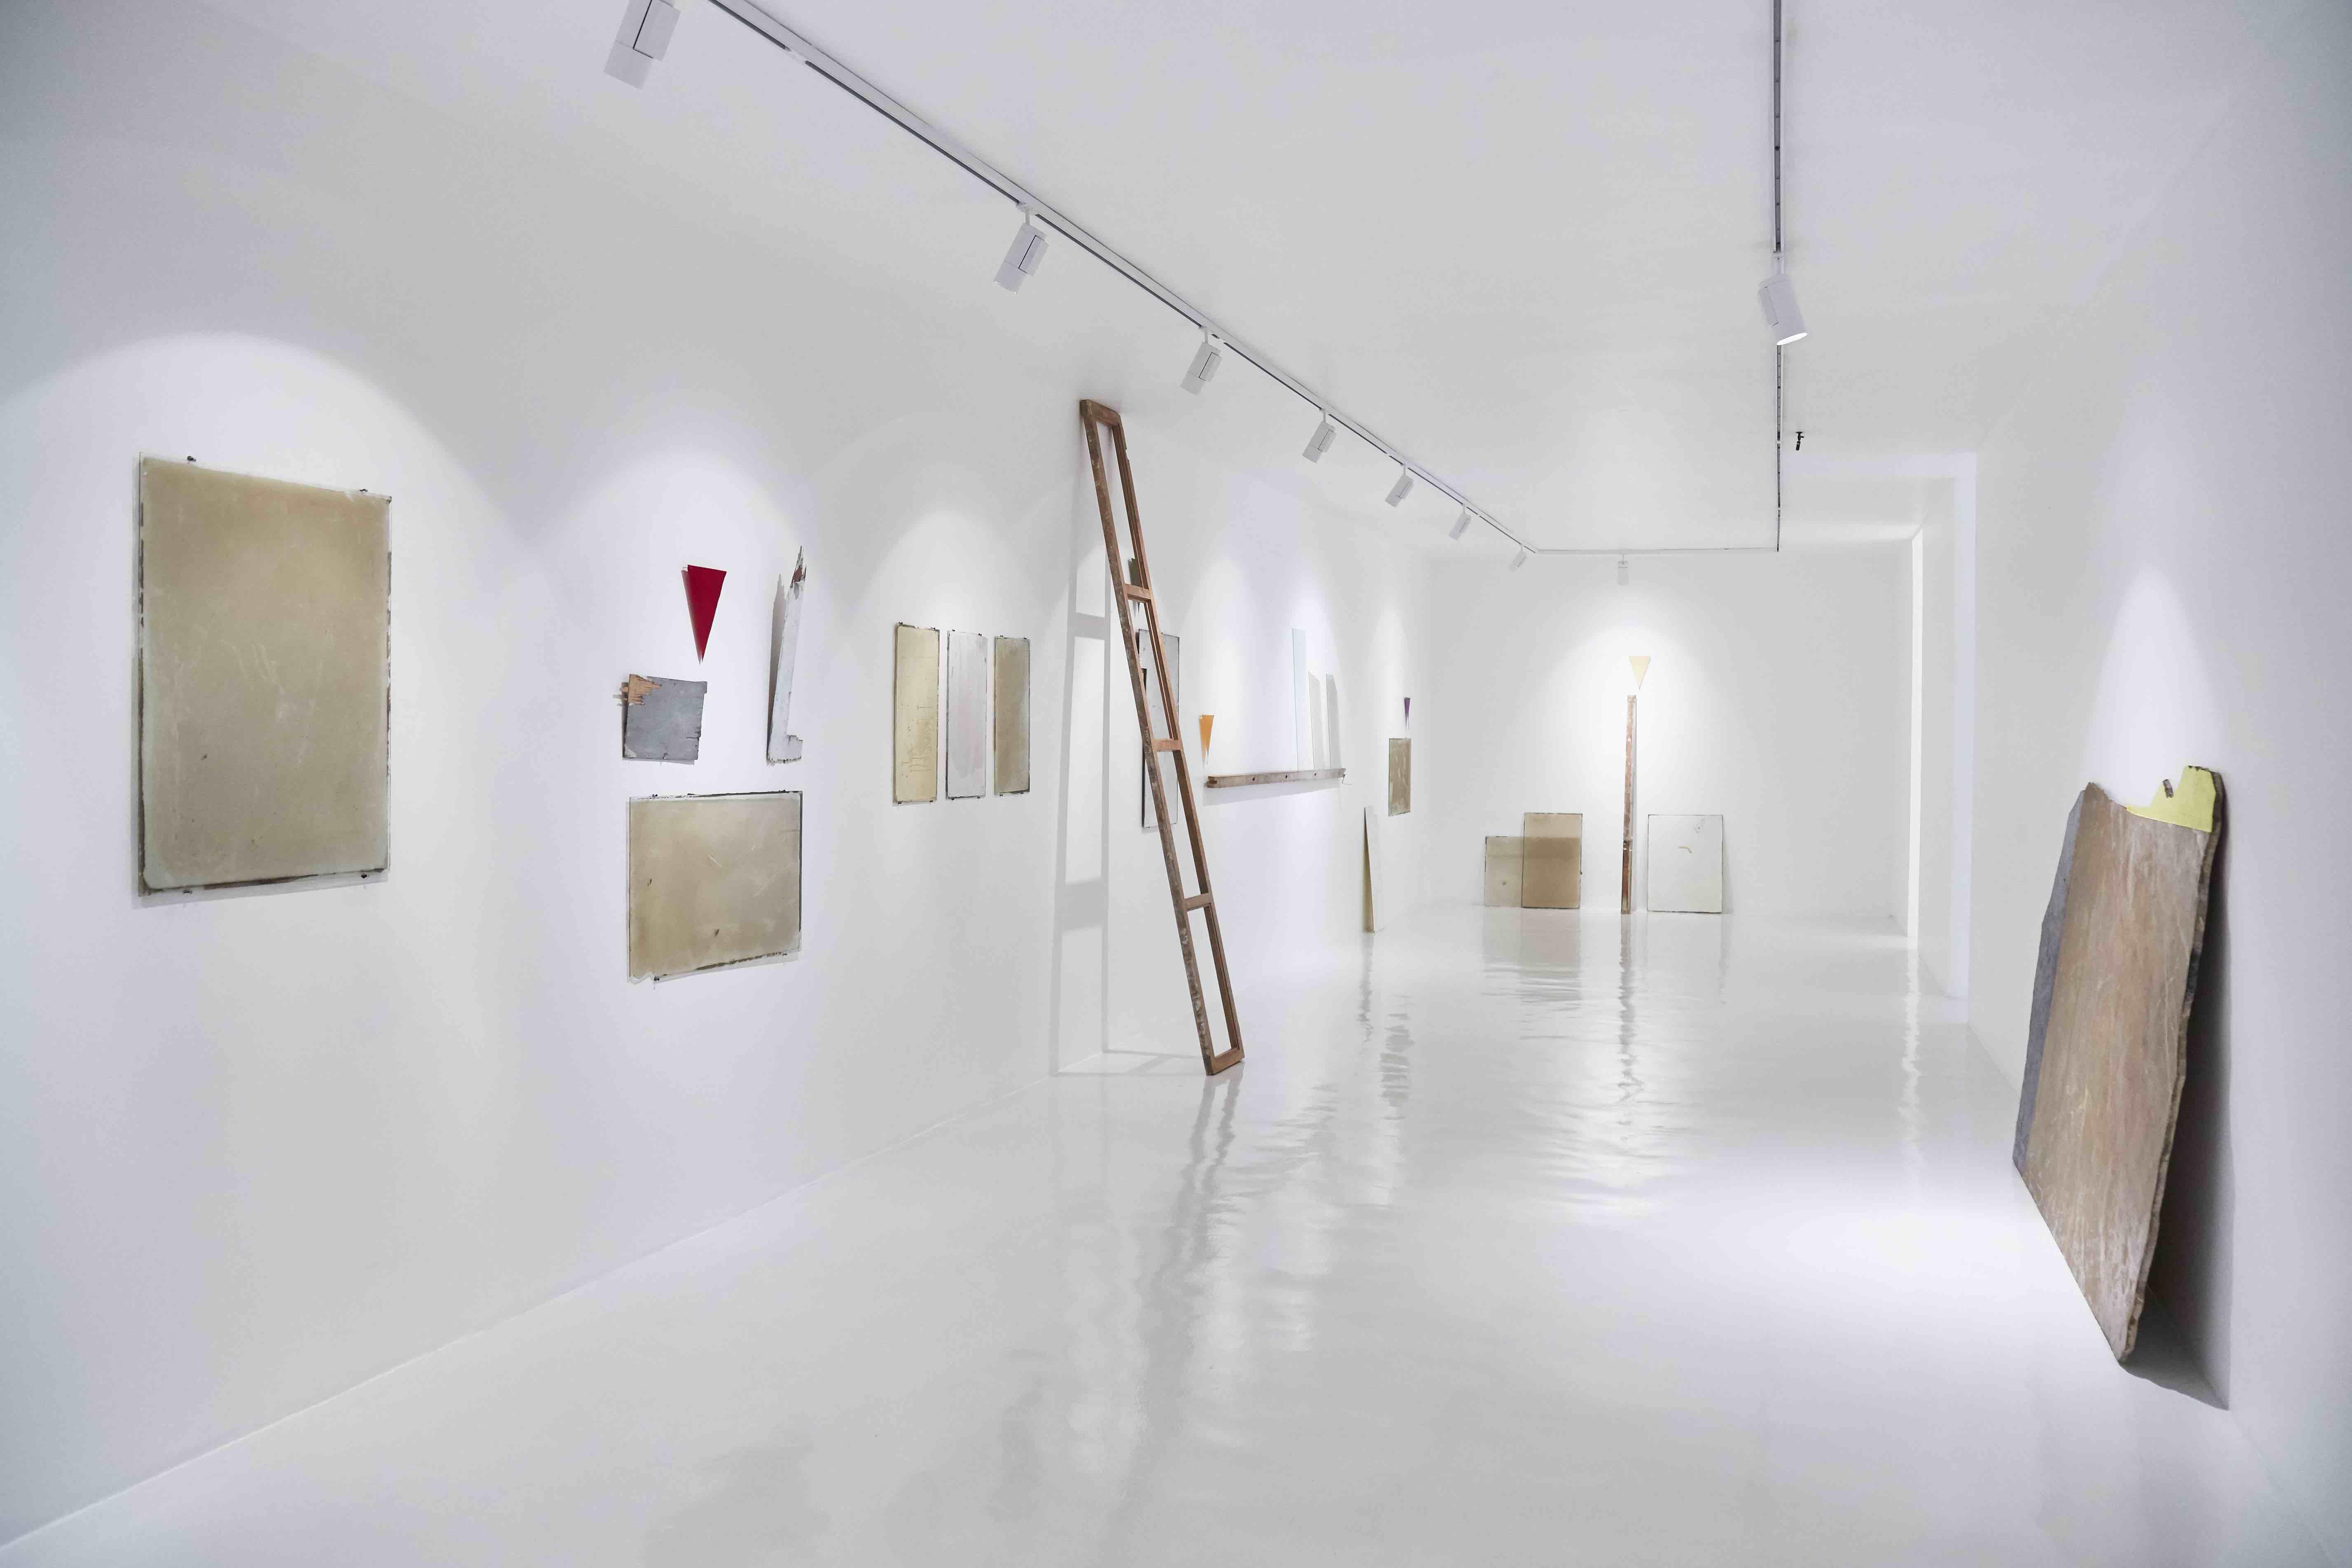 Athina Ioannou, Vista de instalación, 2017, Courtesy: Galería Hilario Galguera, Photo: Sergio López